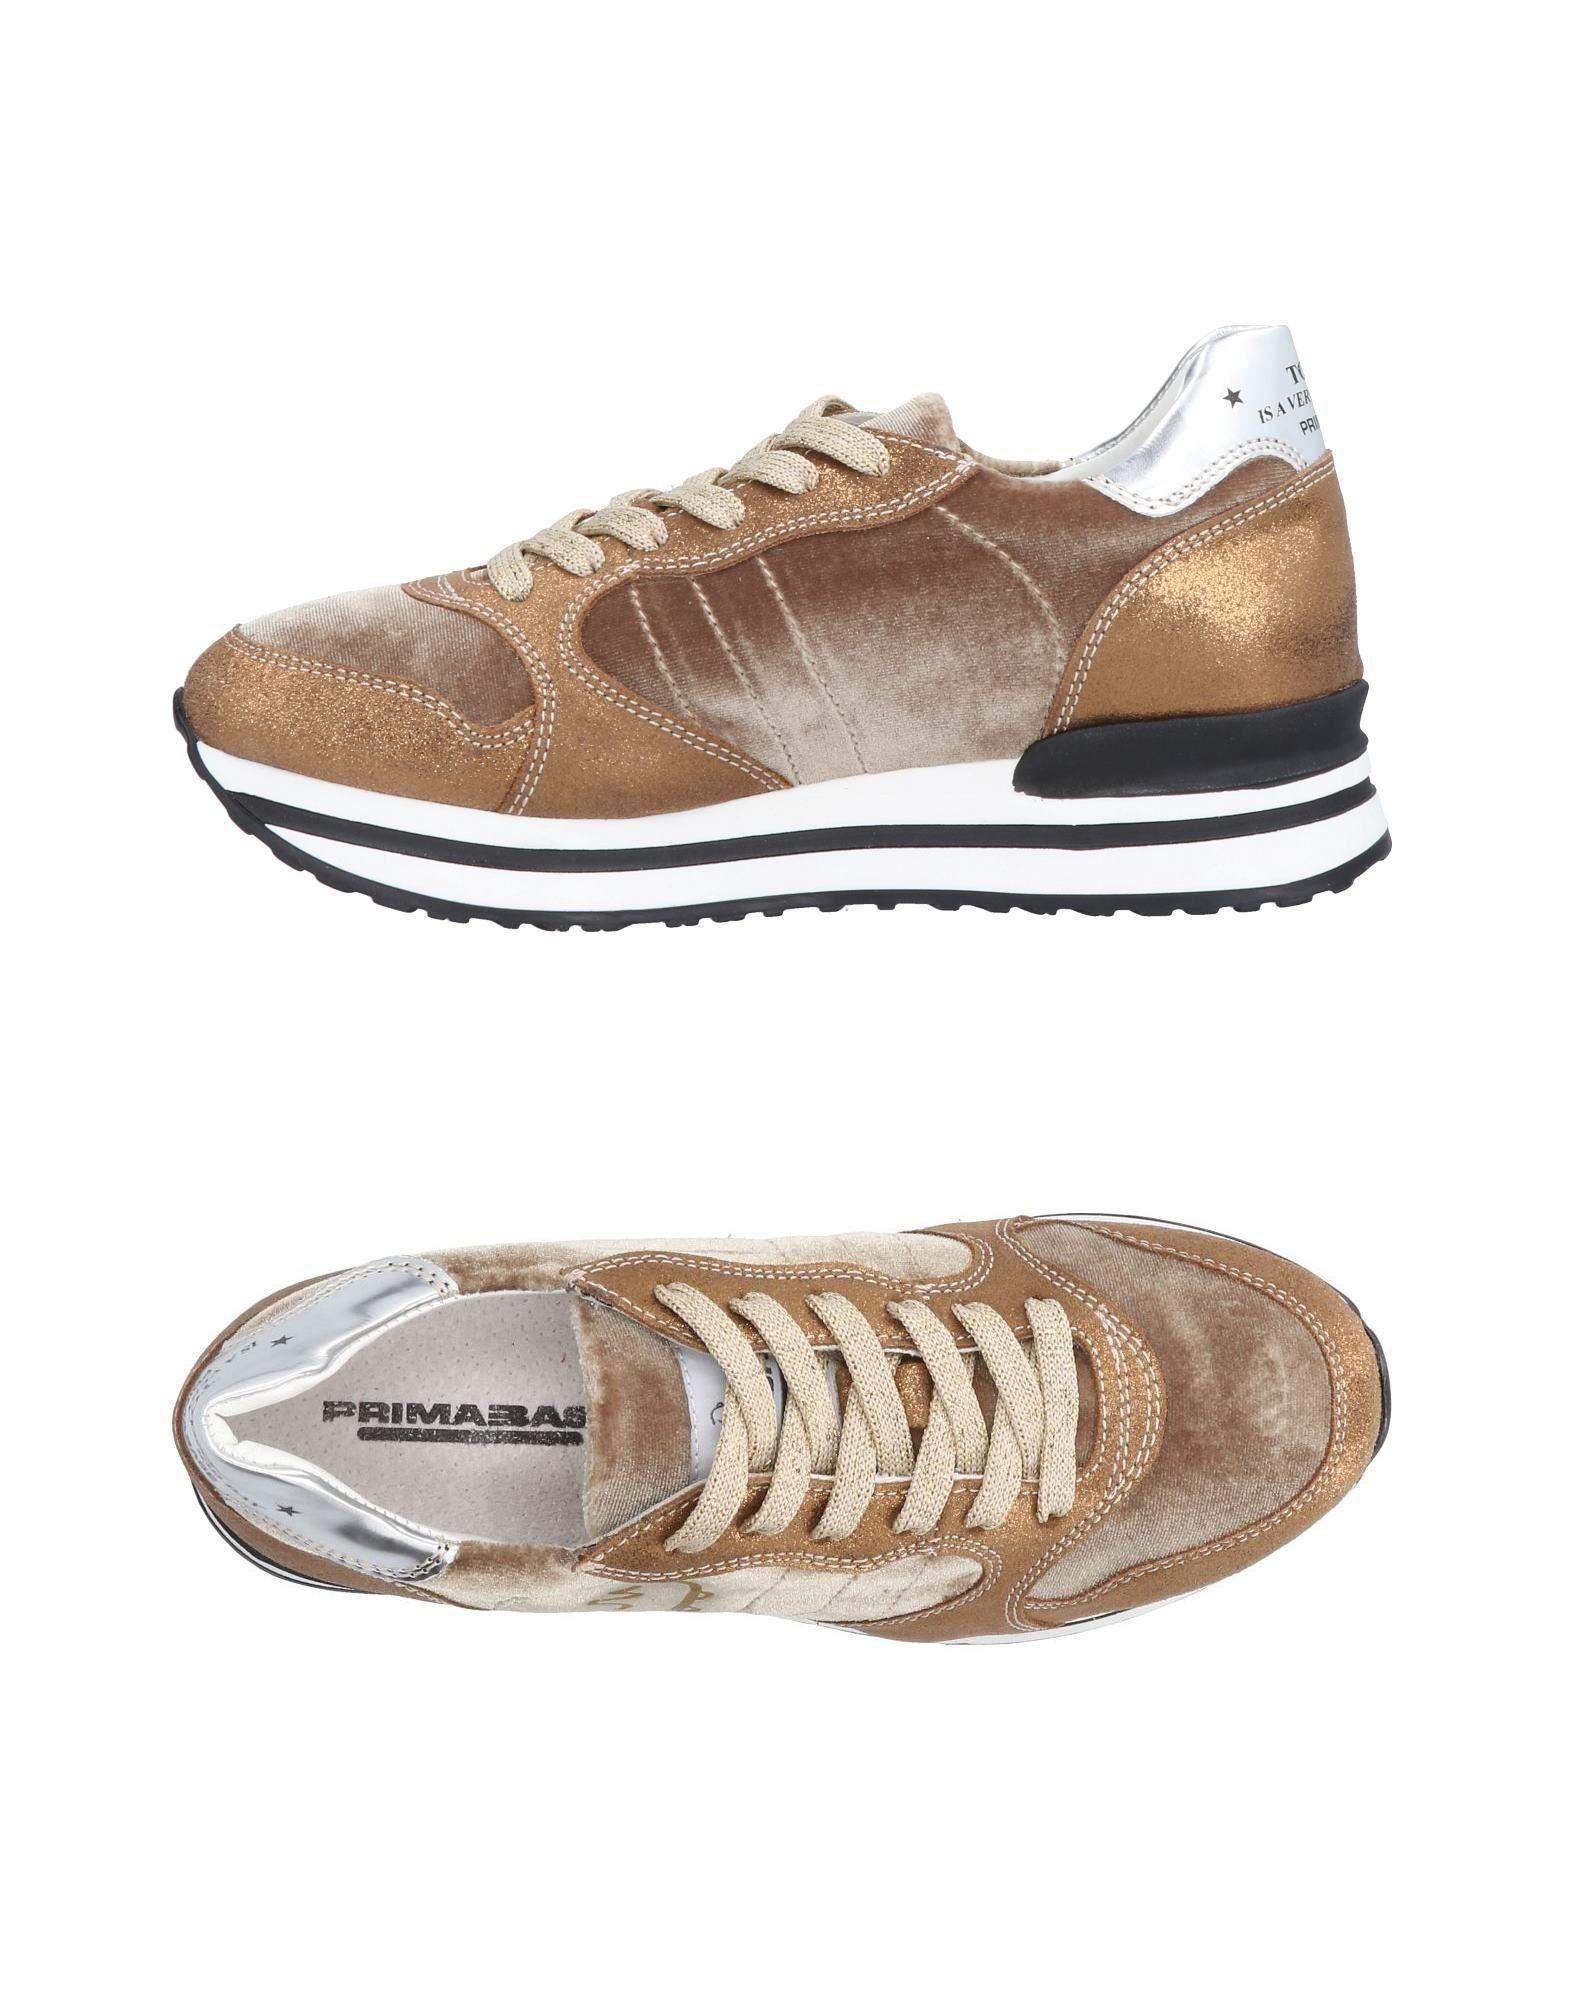 Primabase Sneakers Damen  11474821LW Gute Qualität beliebte Schuhe